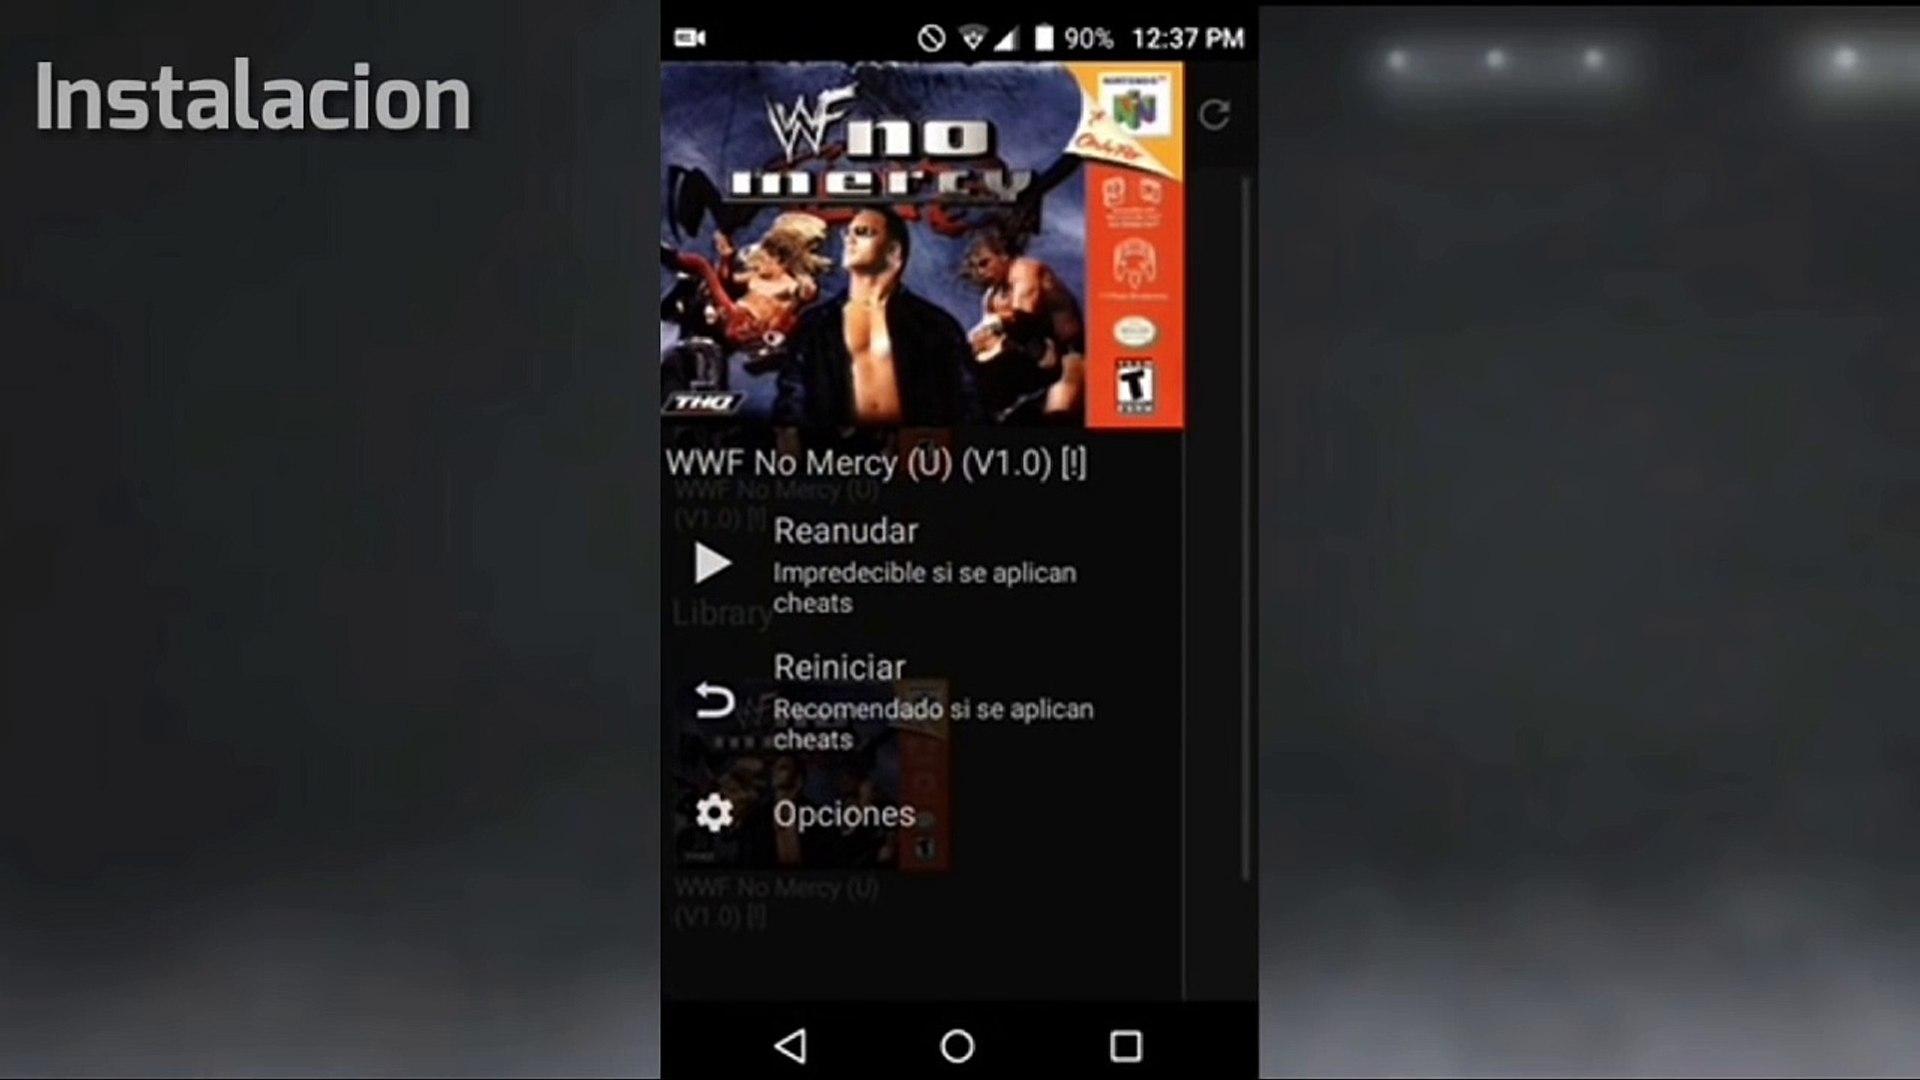 WWF No Mercy 2K17 Mod (Android)